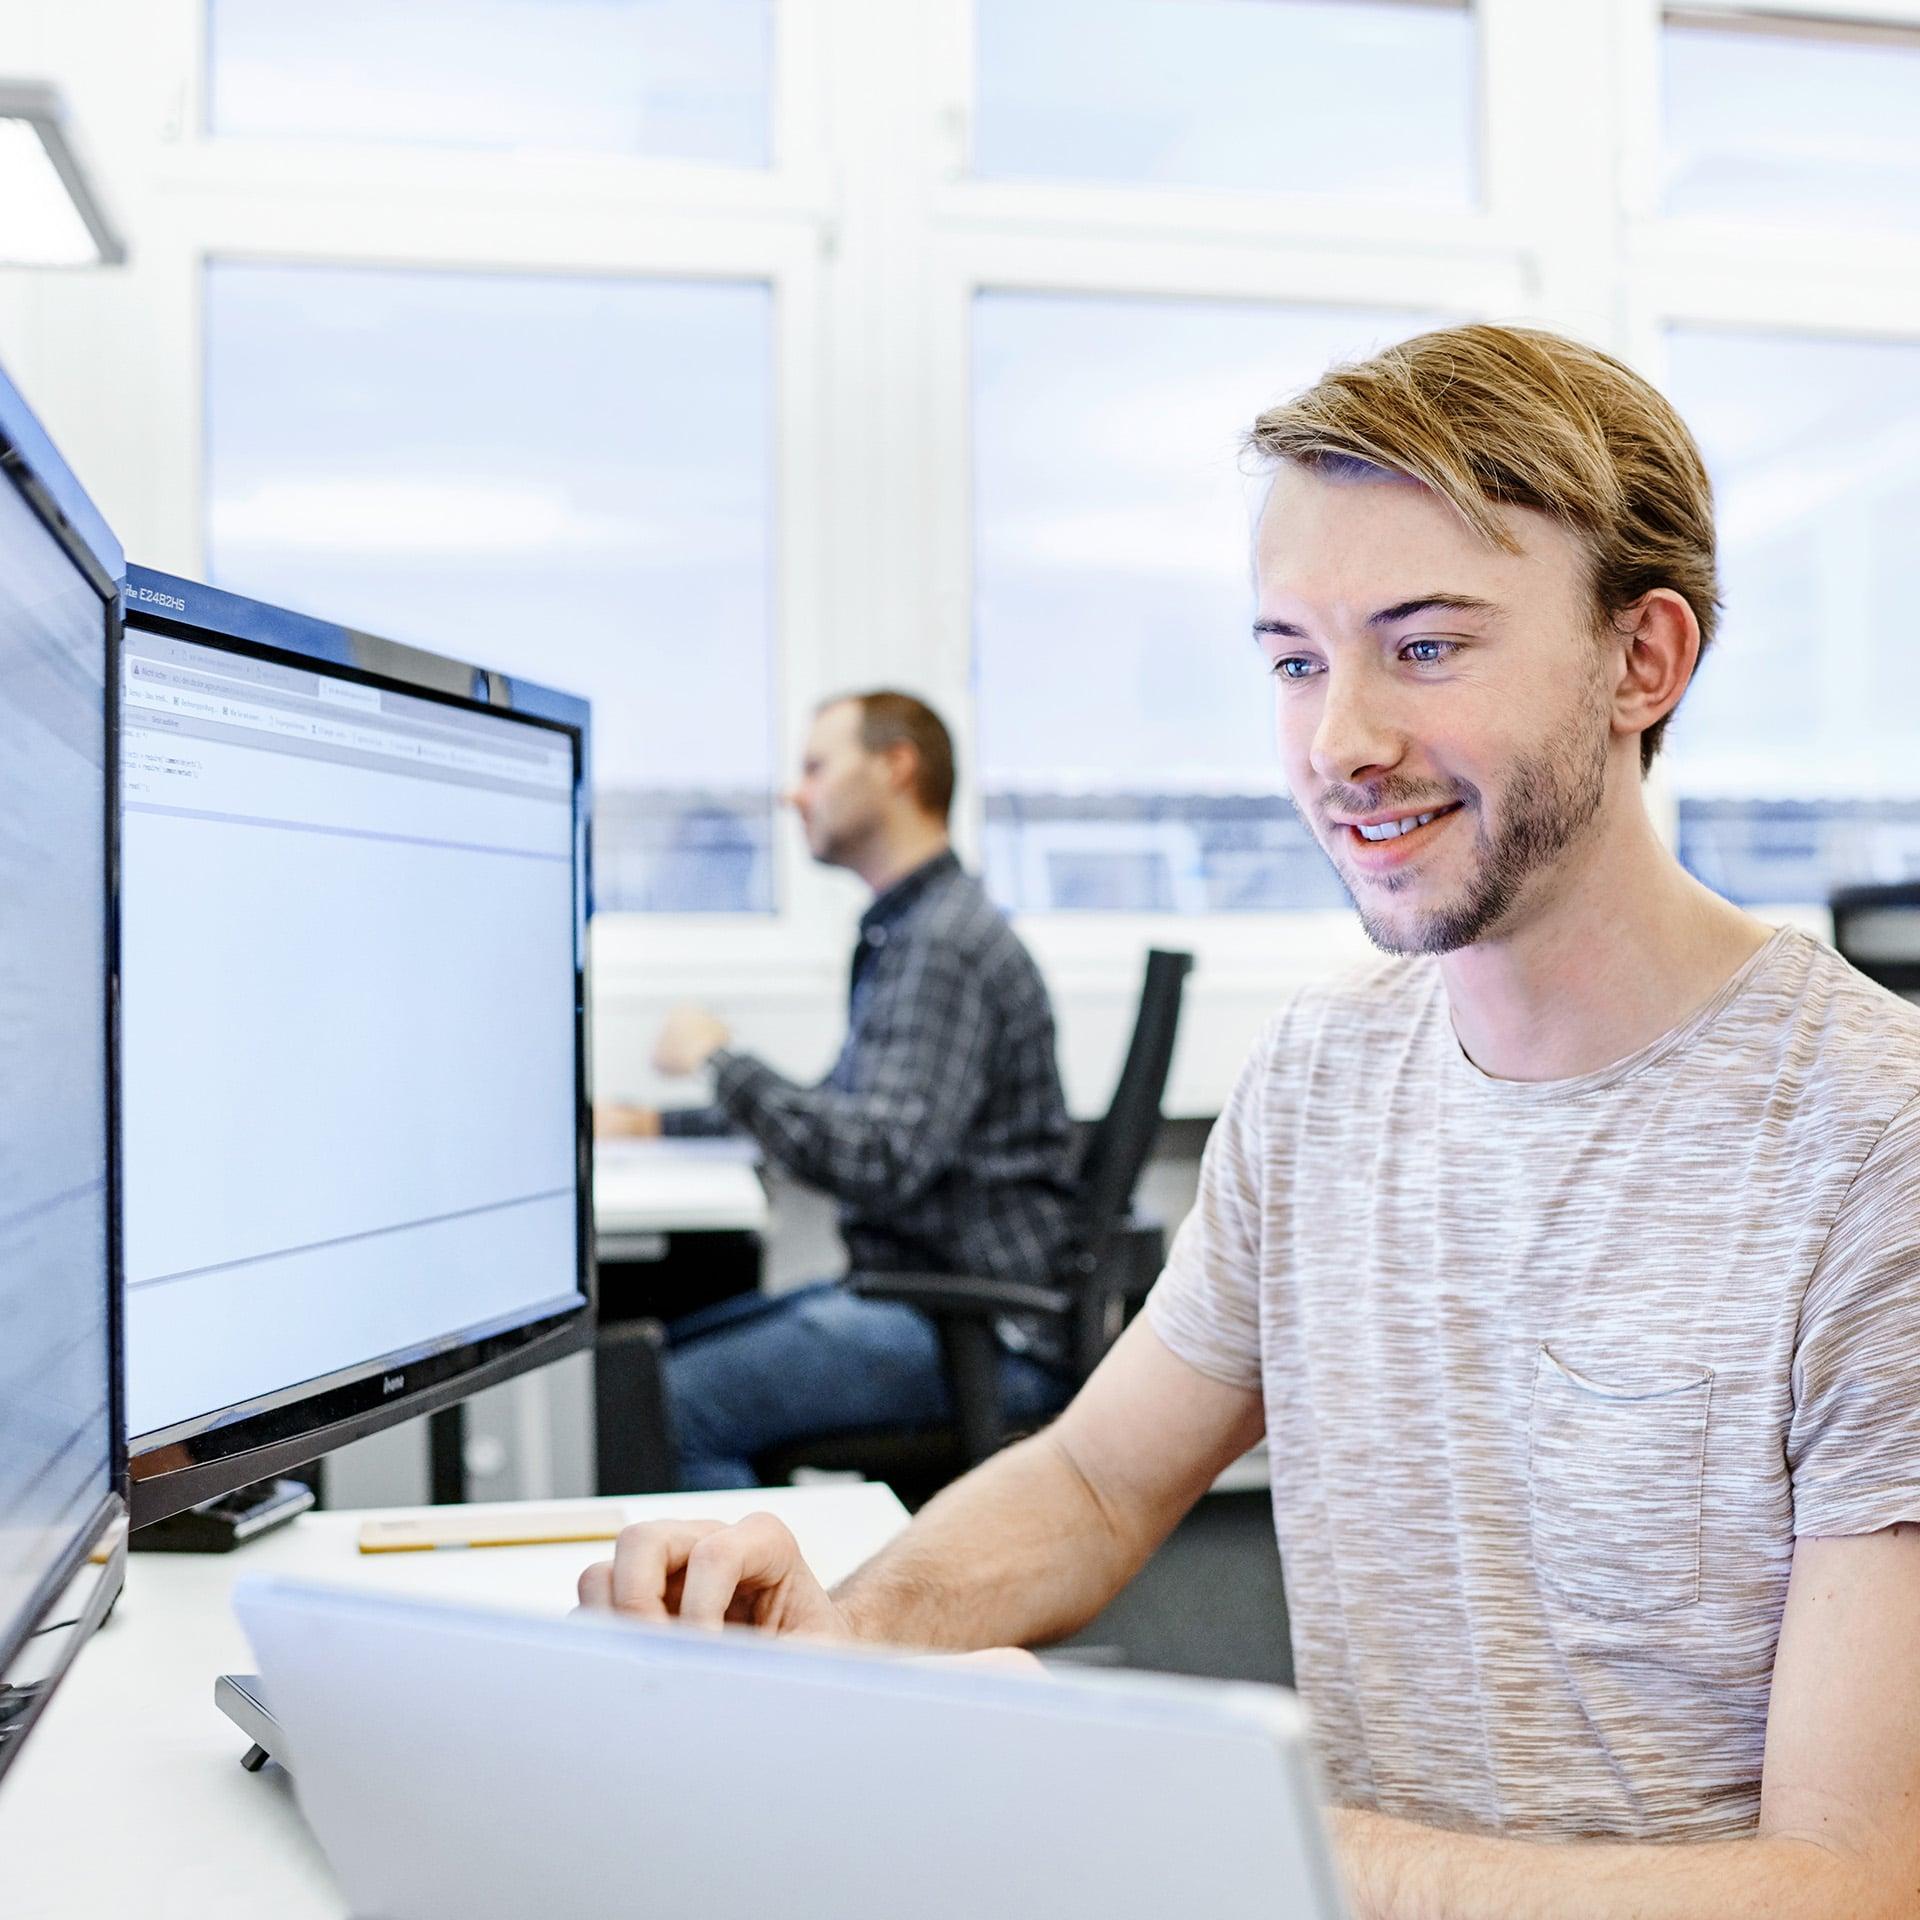 Stellenangebot Software Entwicklung agorum Stuttgart